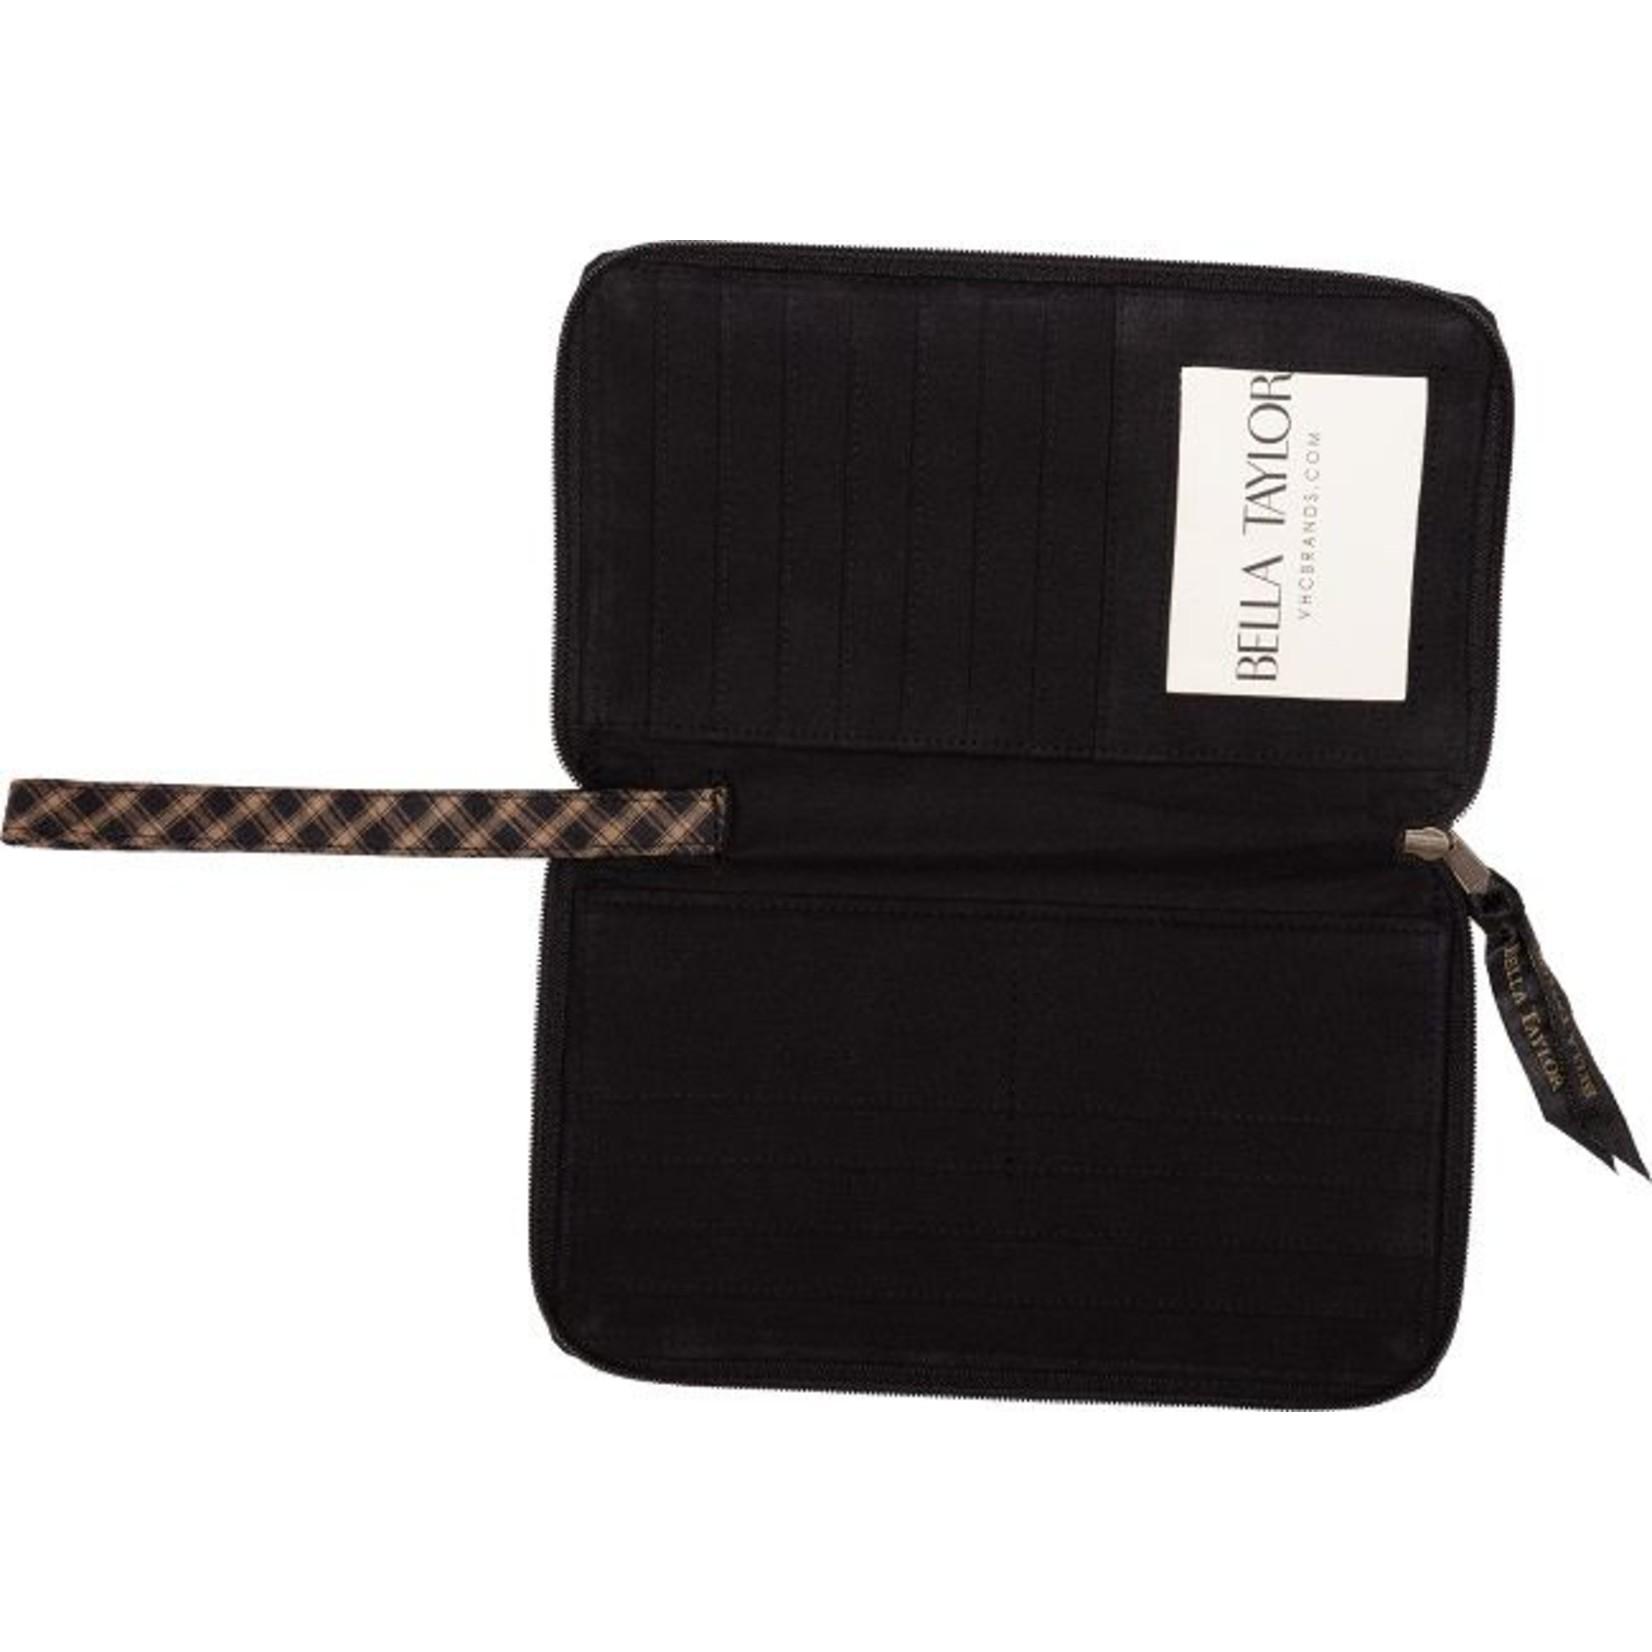 Bella Taylor Beckham - Wrist Strap Wallet